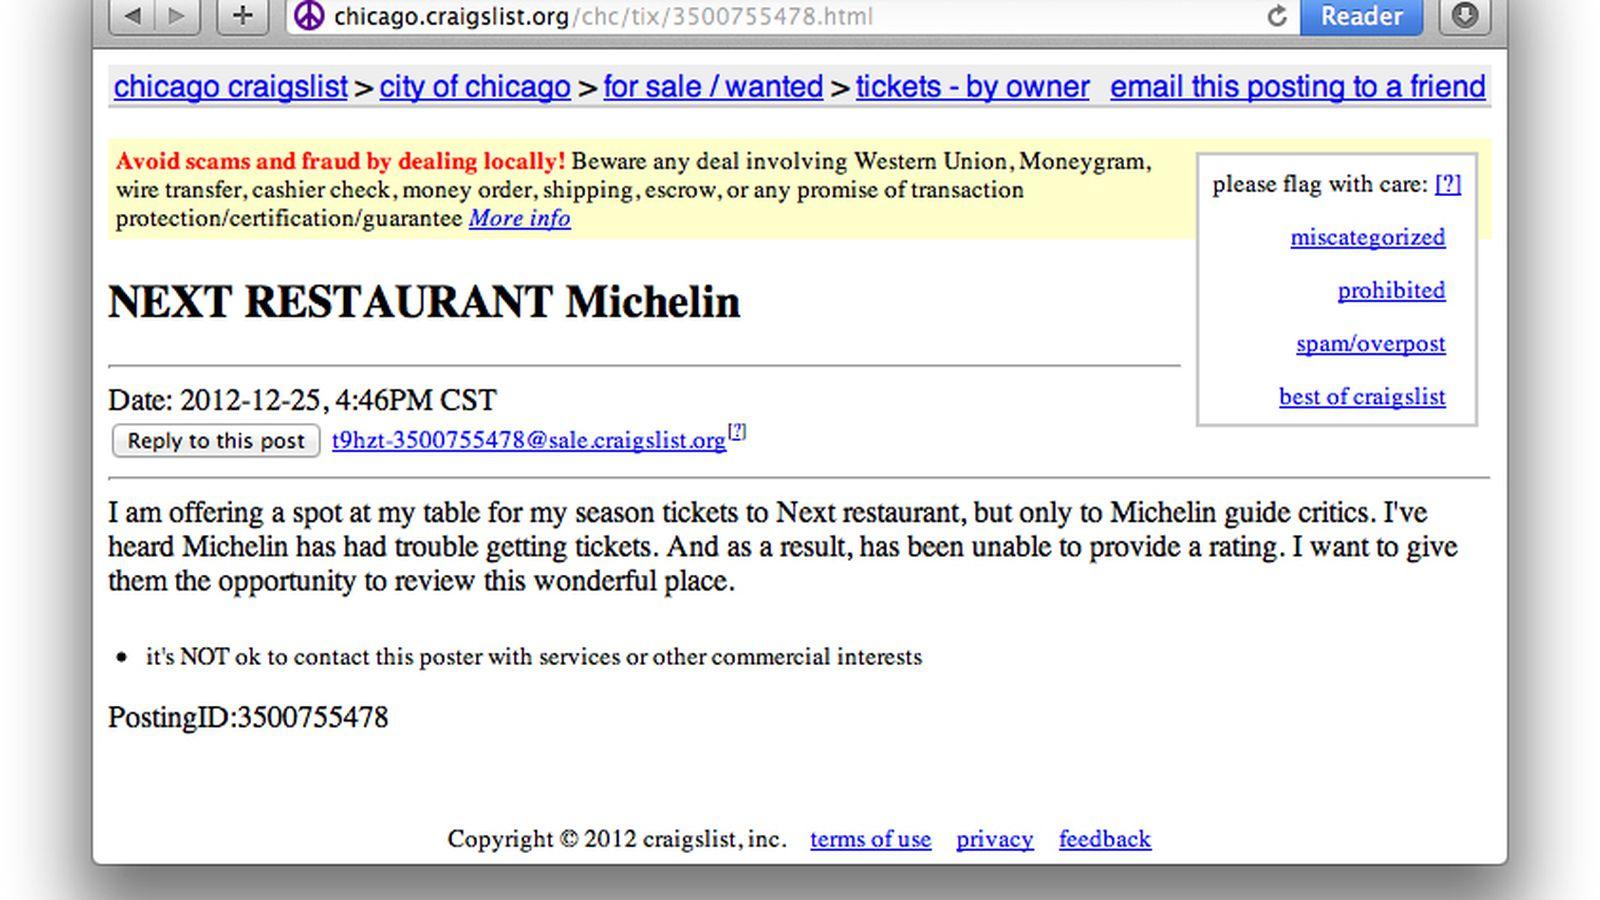 Craigslist Post Offers Next Season Ticket To Michelin Eater